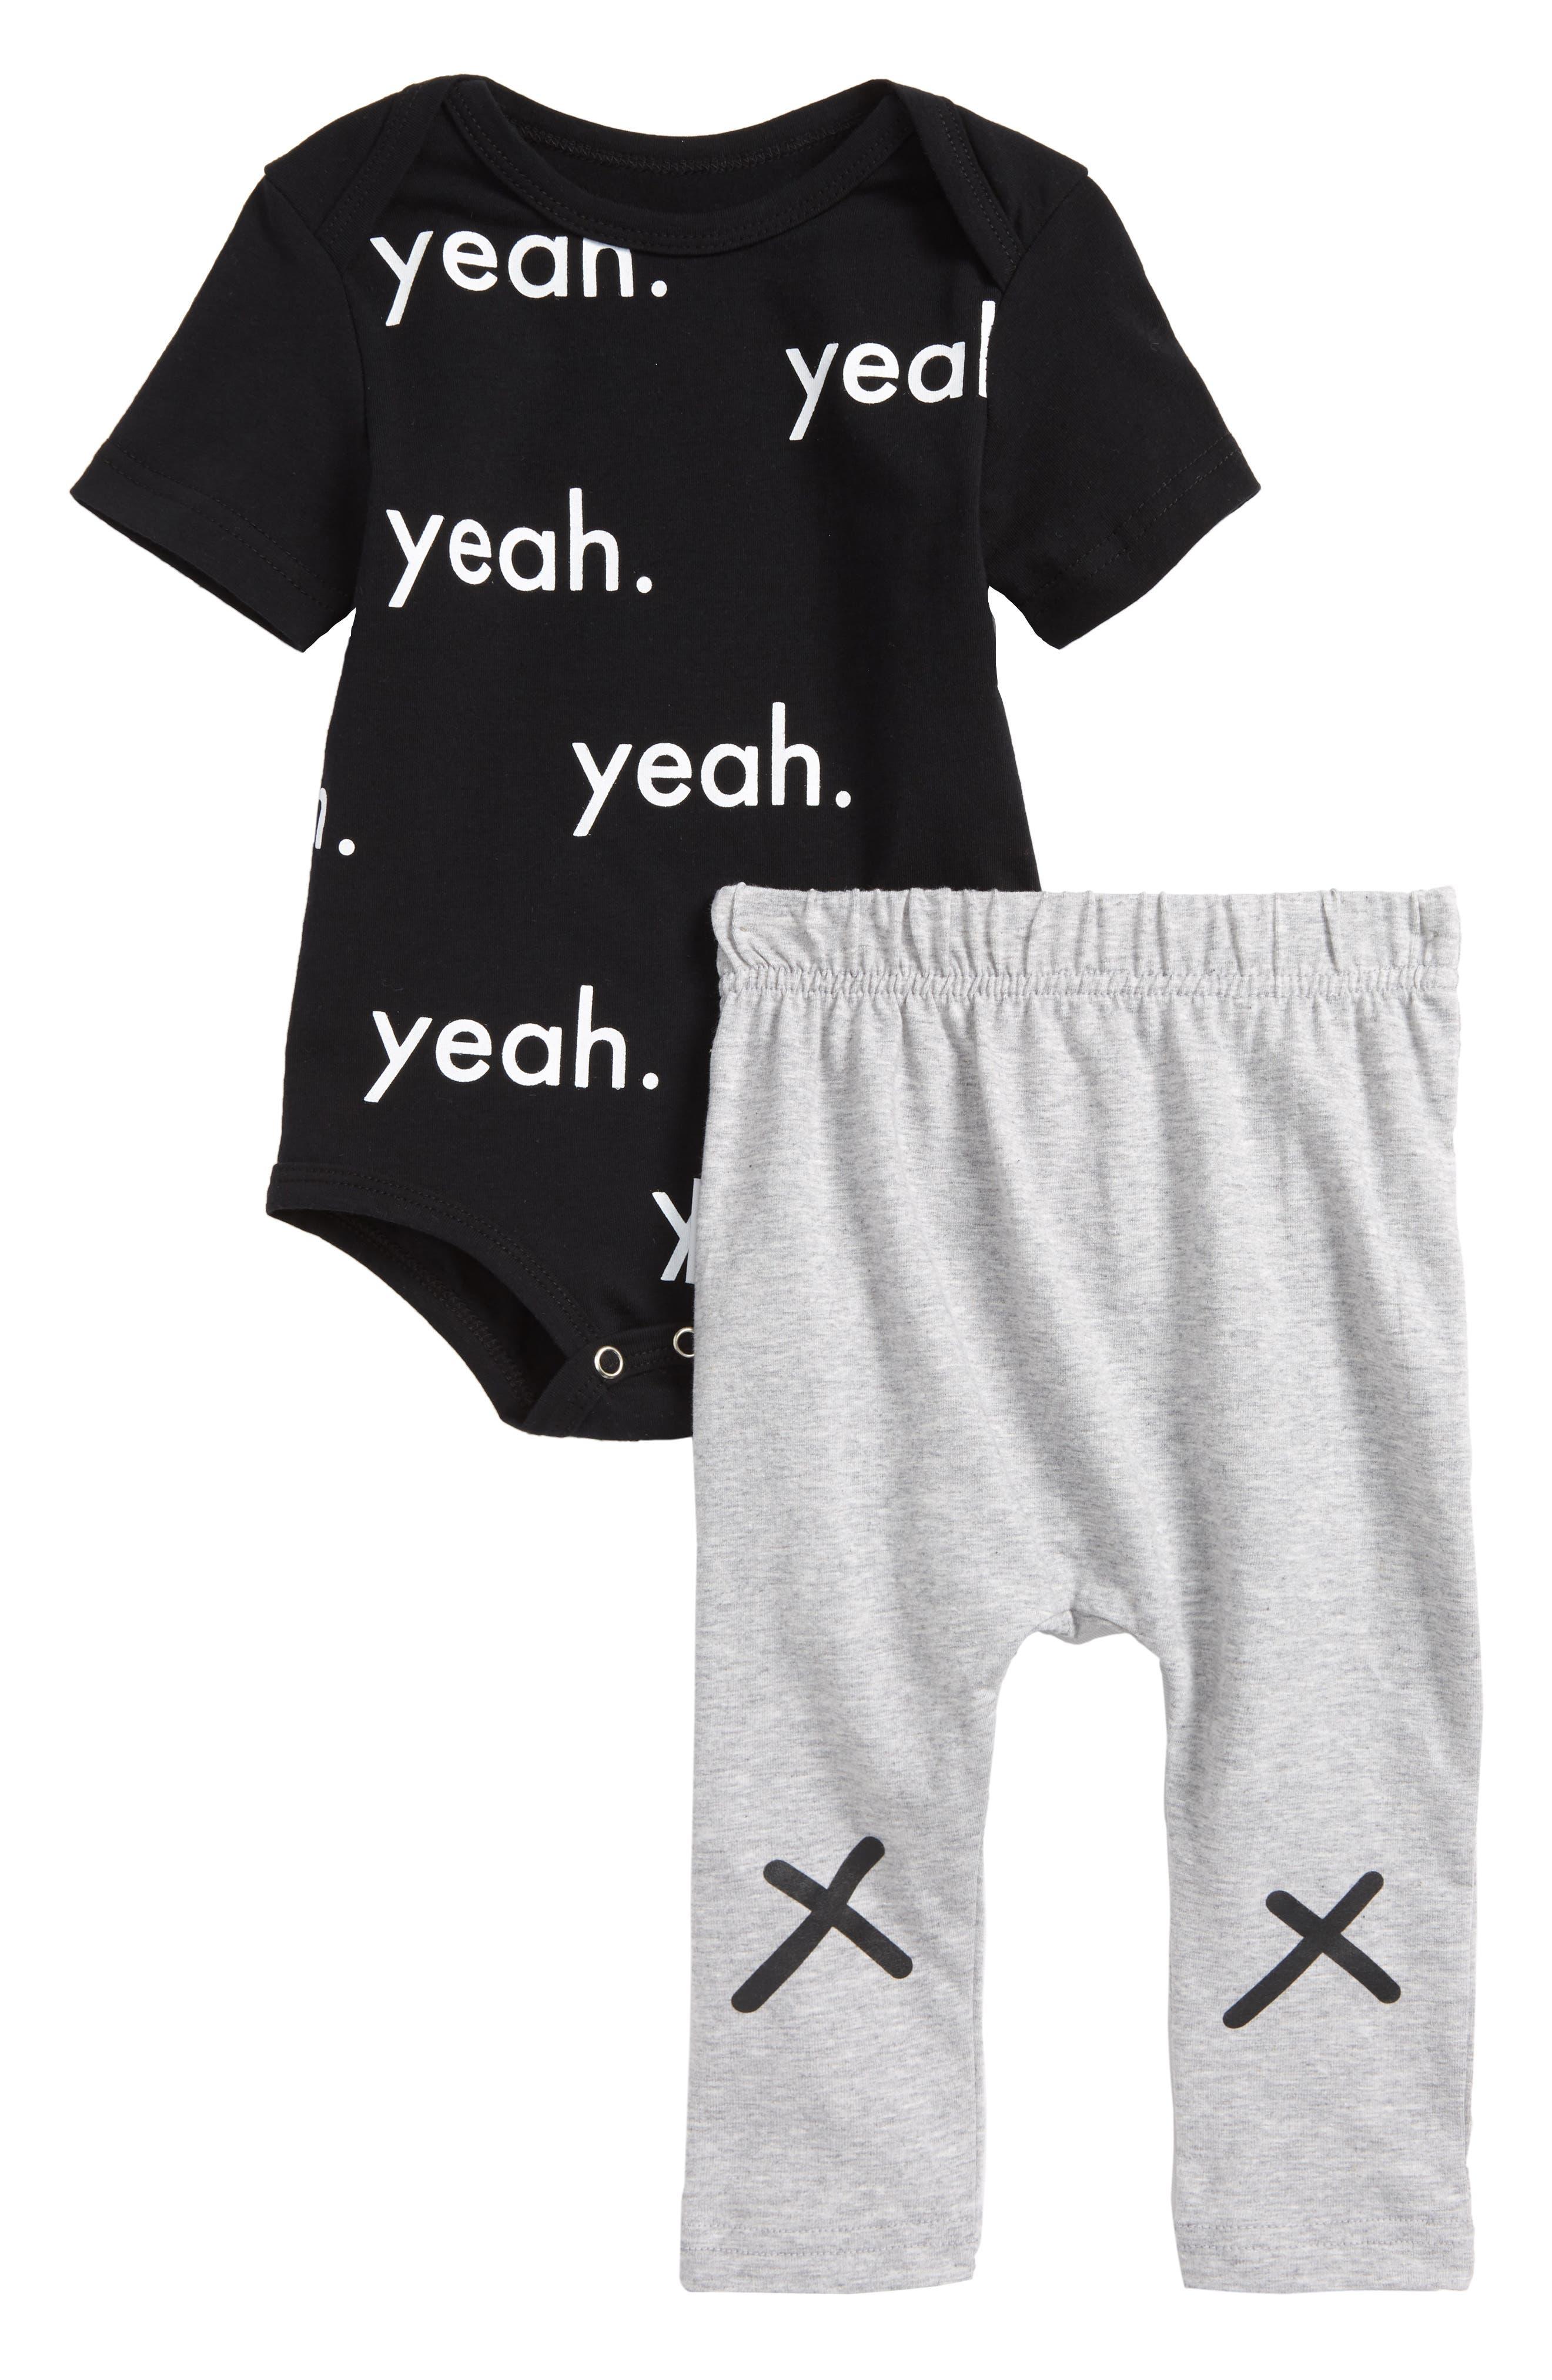 Yeah Bodysuit & Pants Set,                         Main,                         color, Black/ Grey